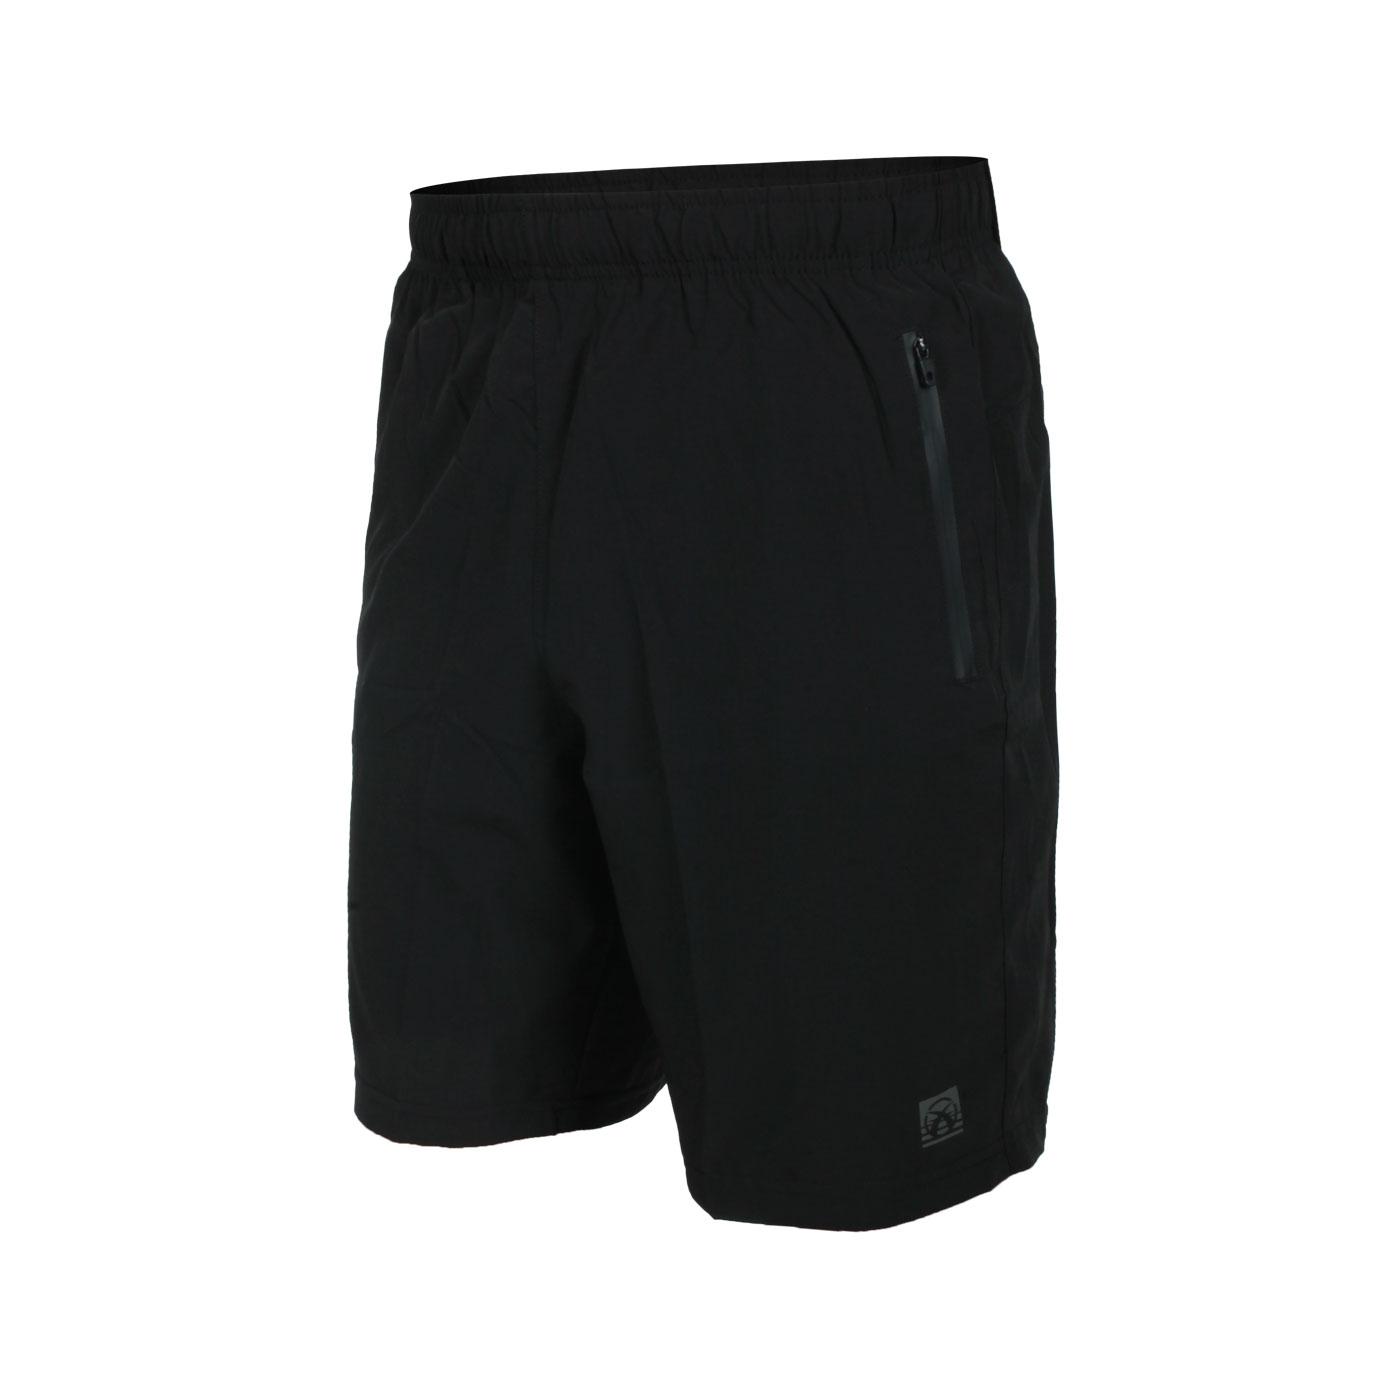 FIRESTAR 男款彈性平織短褲 C1718-10 - 黑銀